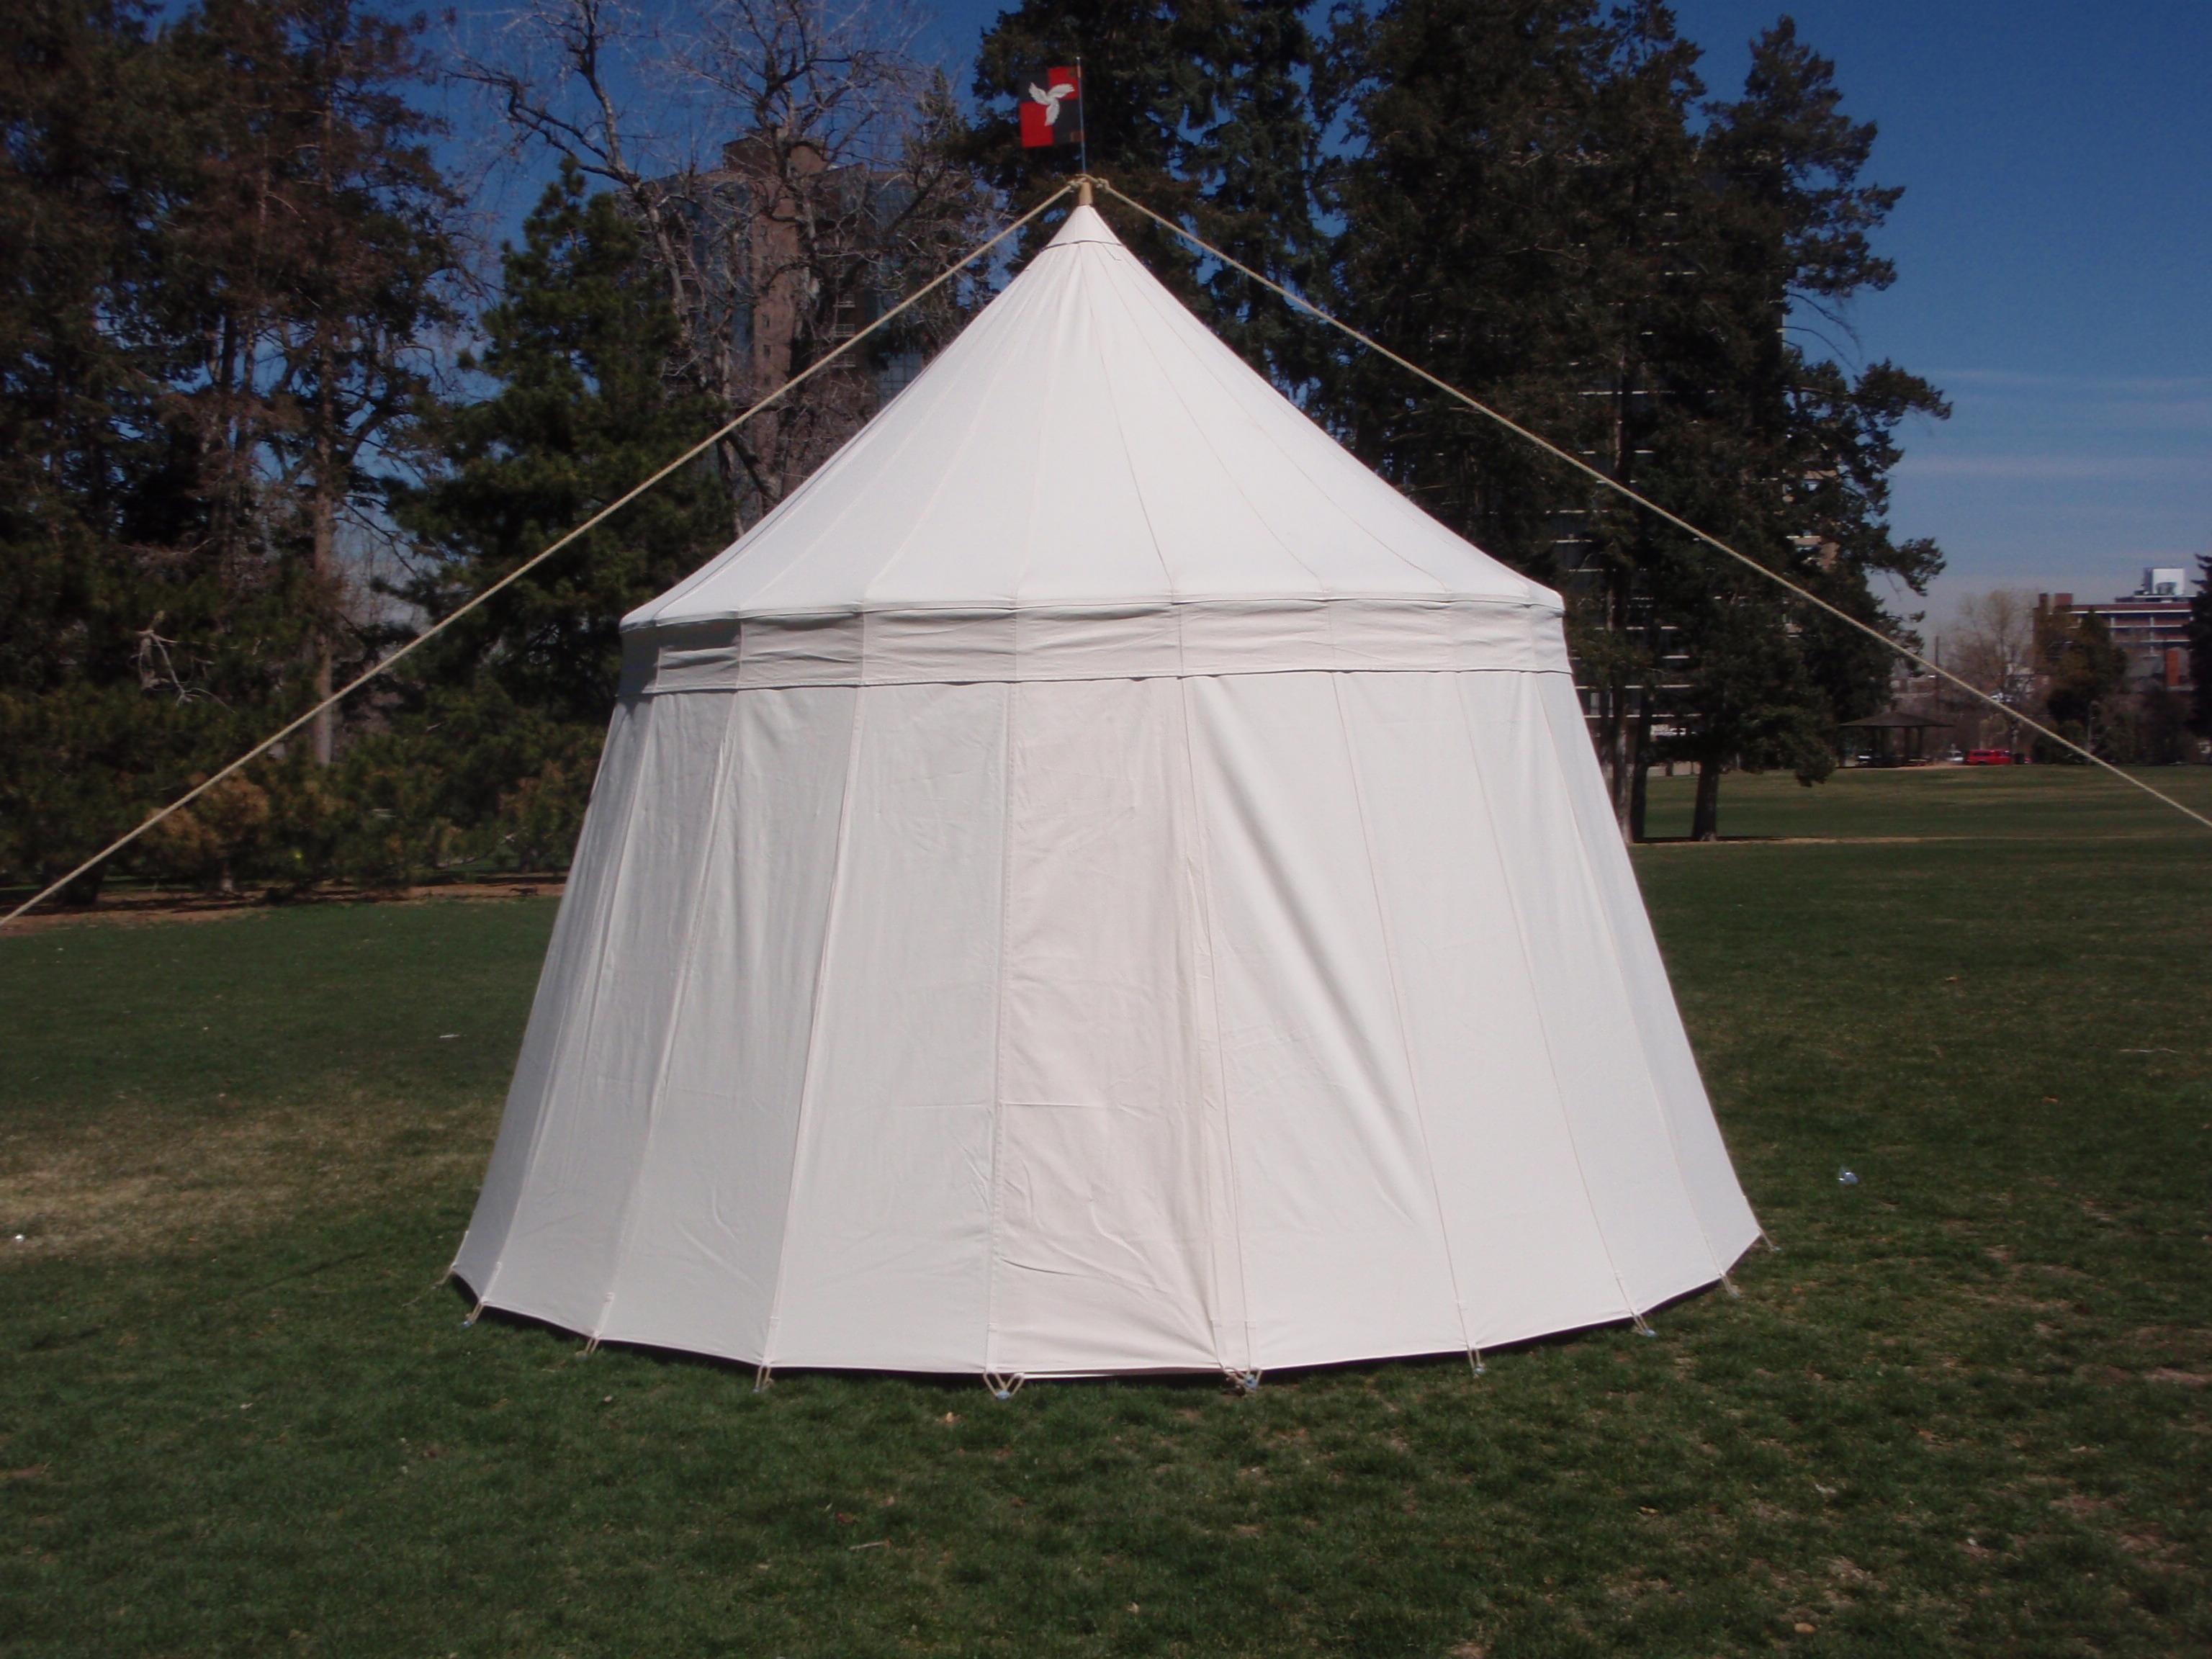 22 Panel tent & Fritz Wilhelm - Tent u003e Panel Width